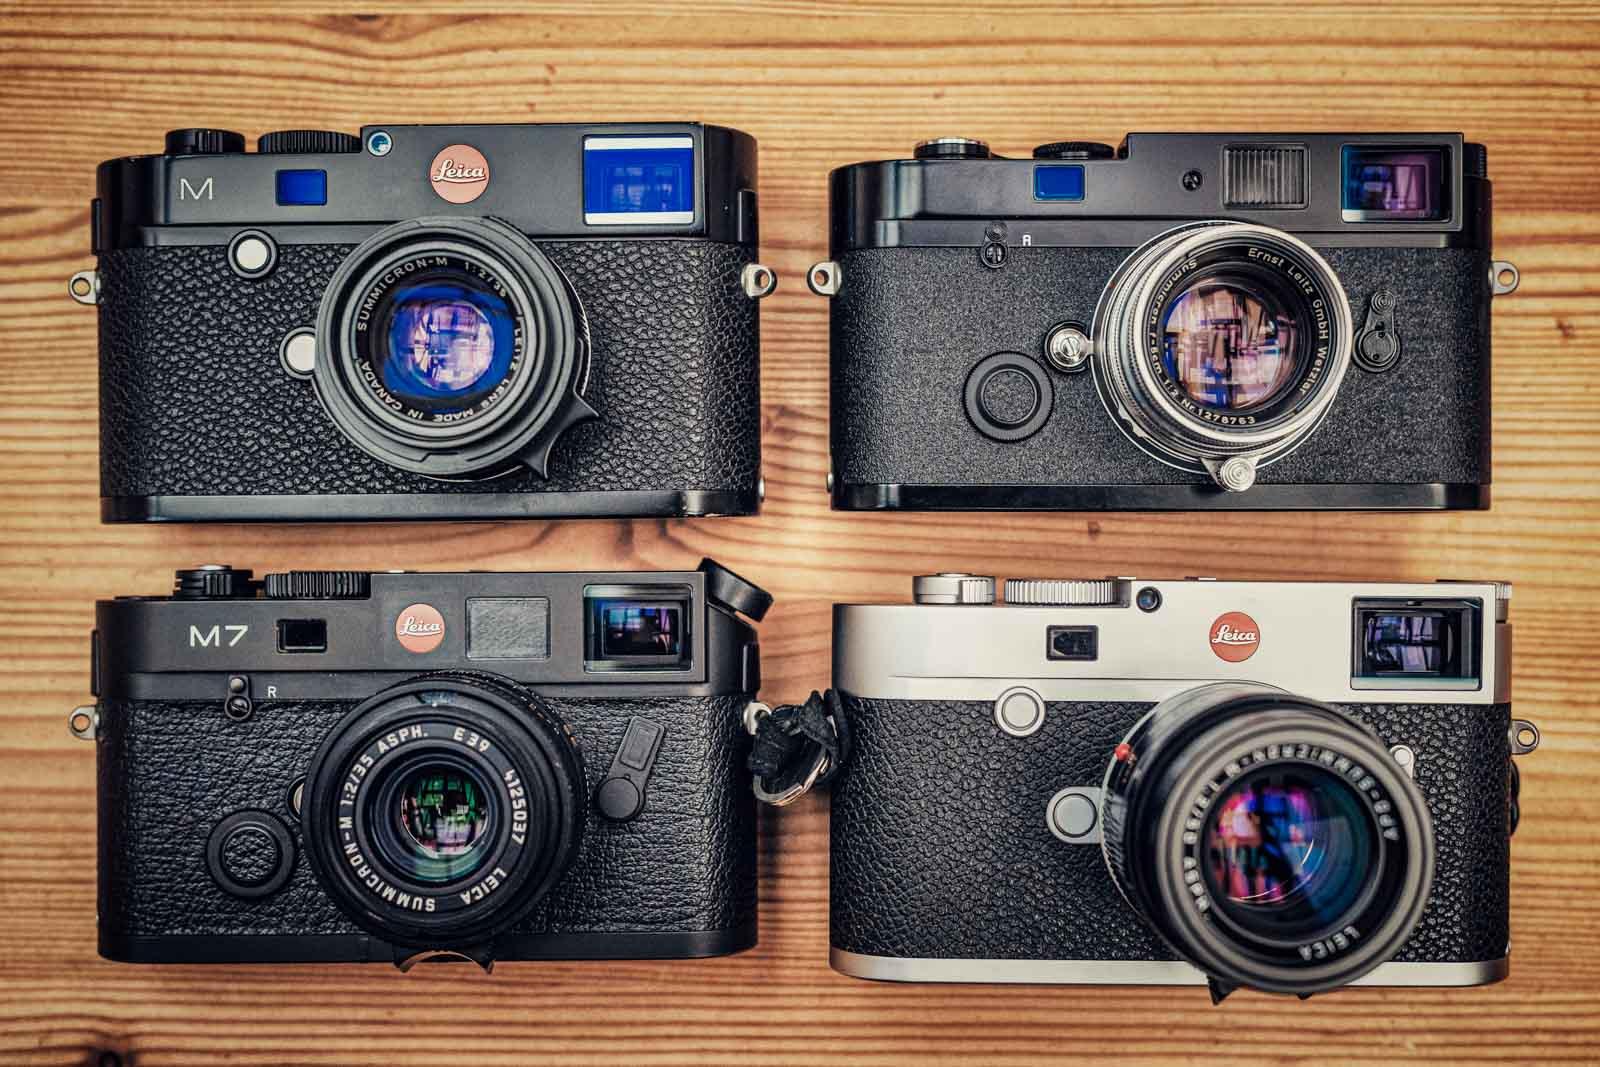 Leica M digital + Analog M7 + MP